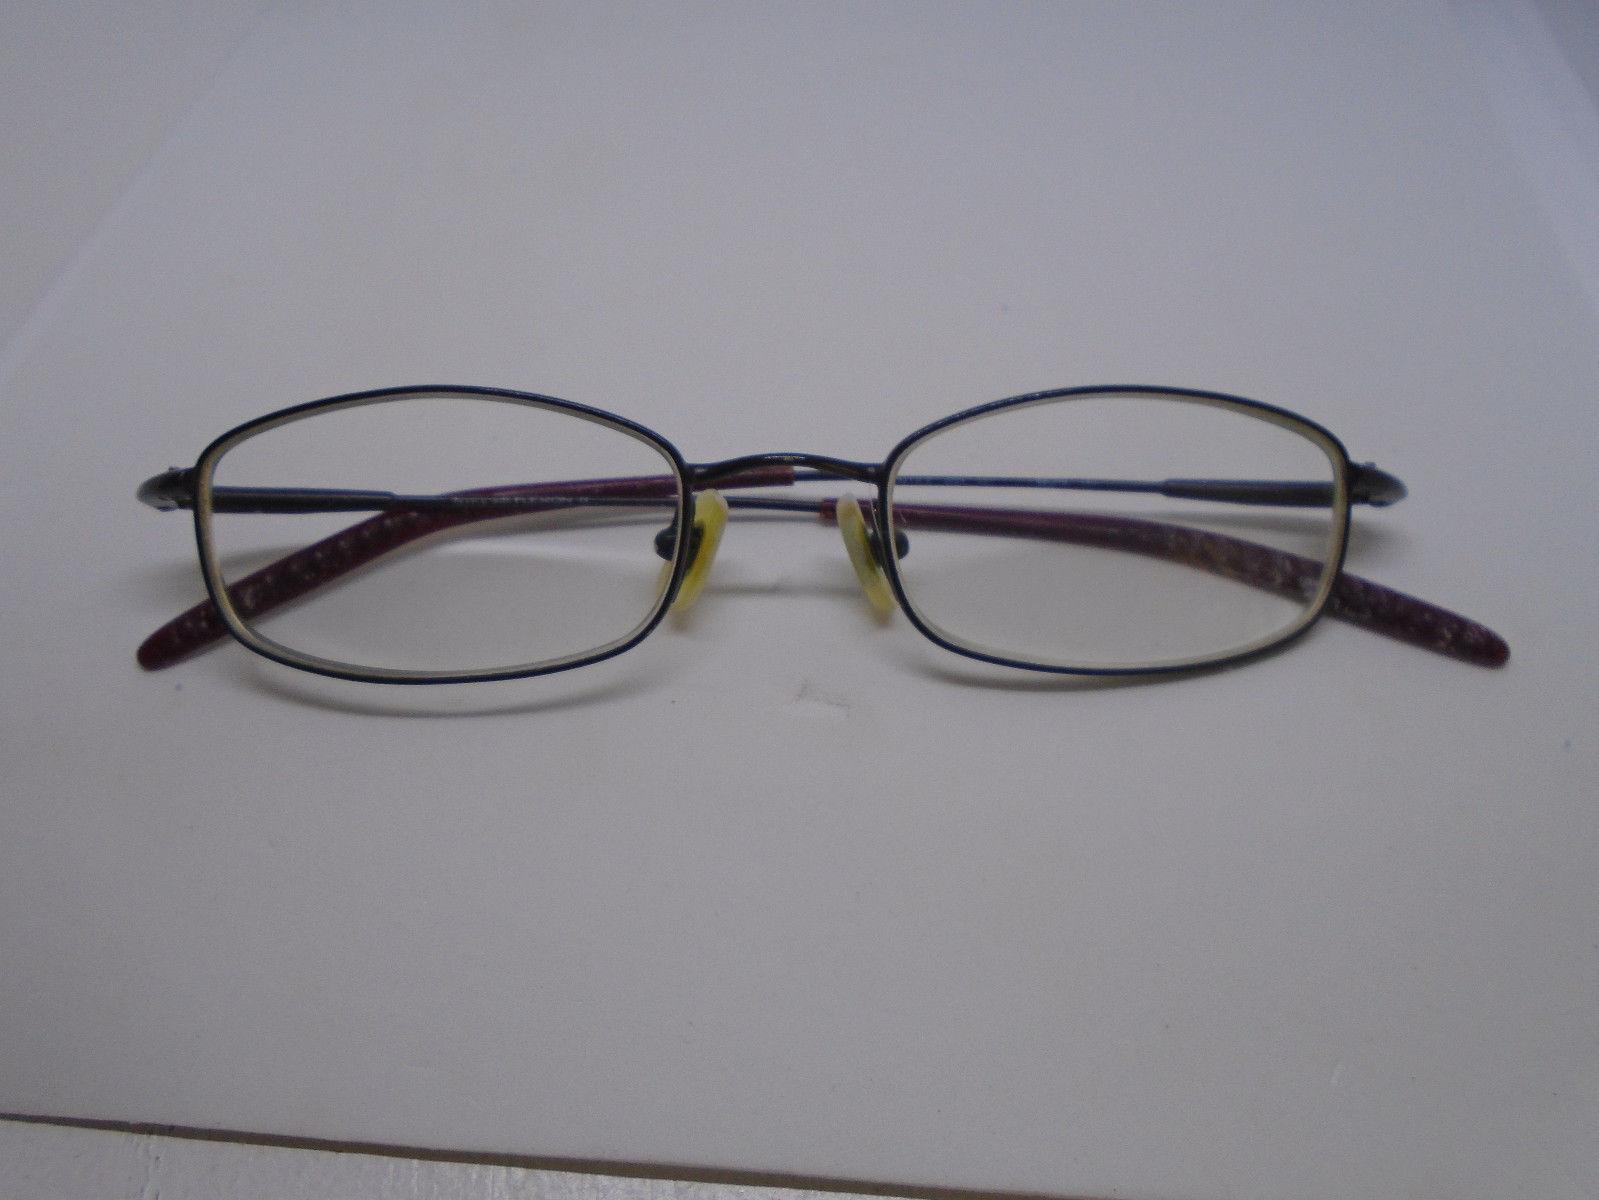 c69d1a2441 NIKE with FLEXON Eyeglasses 4093 001 Black and 15 similar items